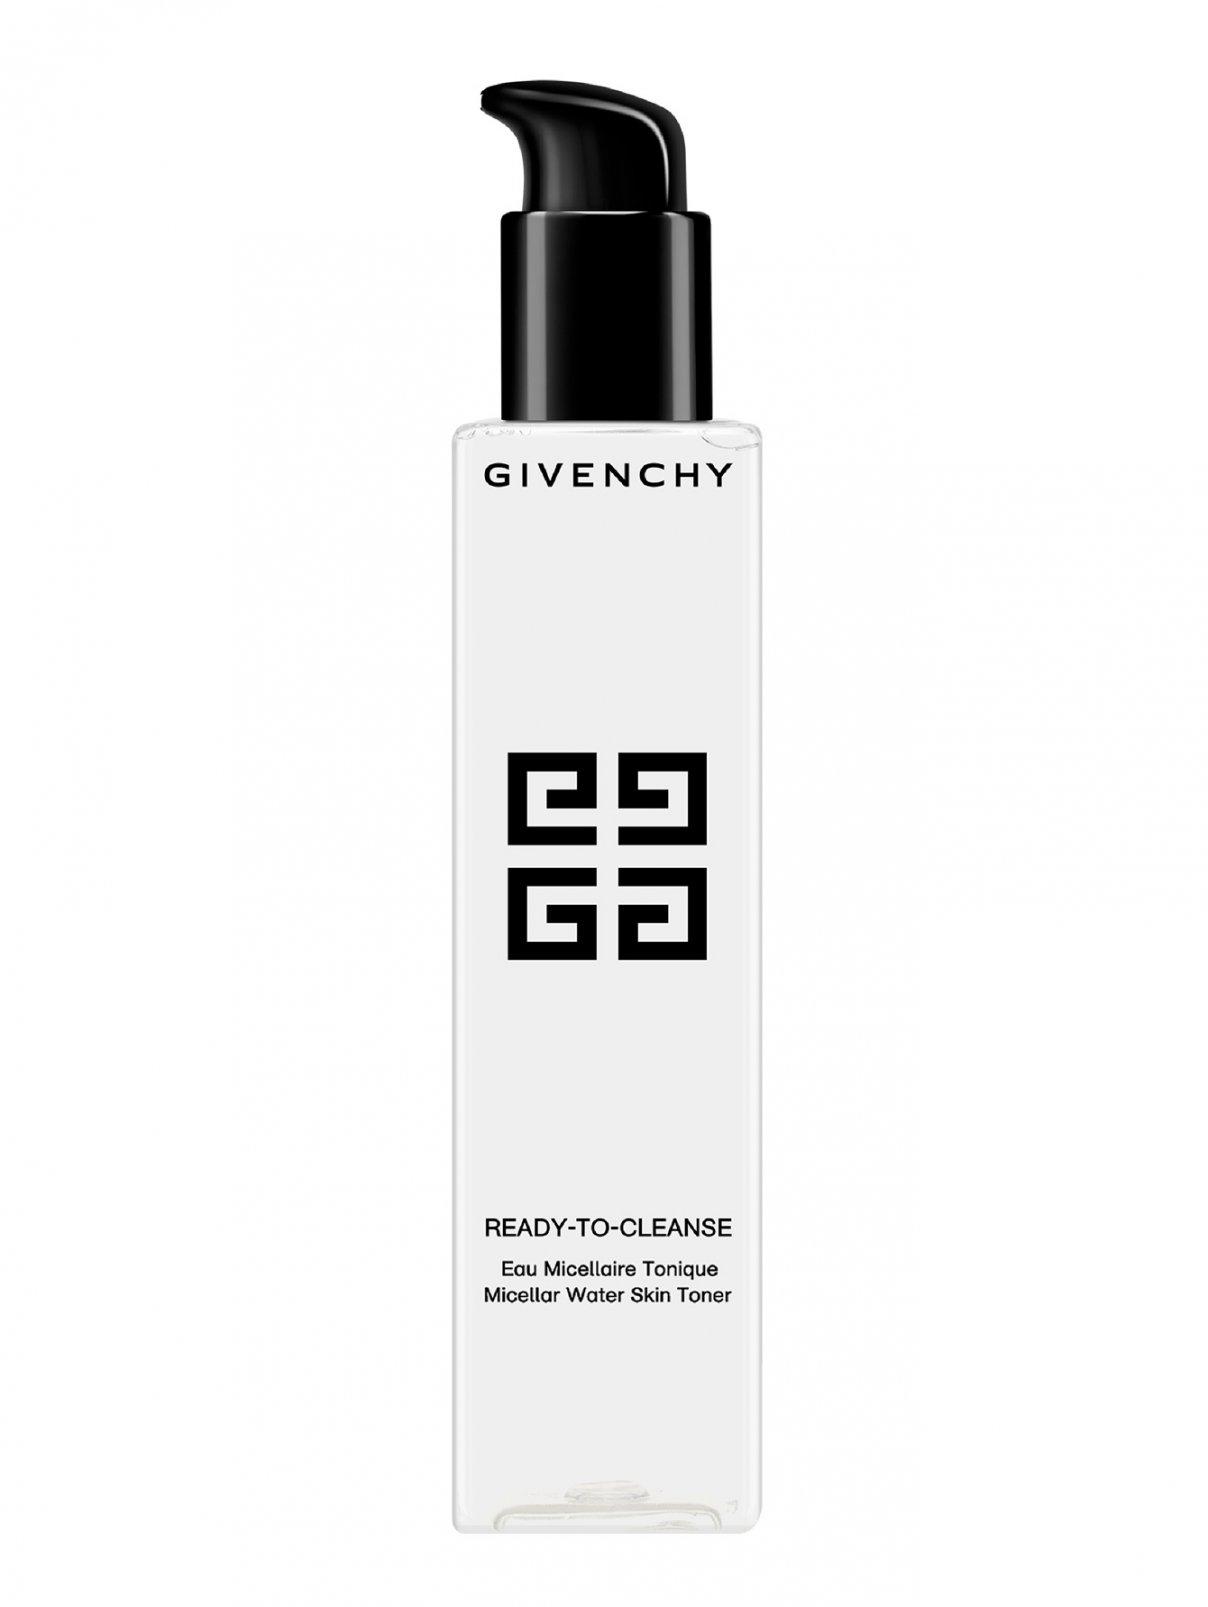 Мицеллярная вода для снятия макияжа с лица и век READY-TO-CLEANSE, 200 мл Givenchy  –  Общий вид